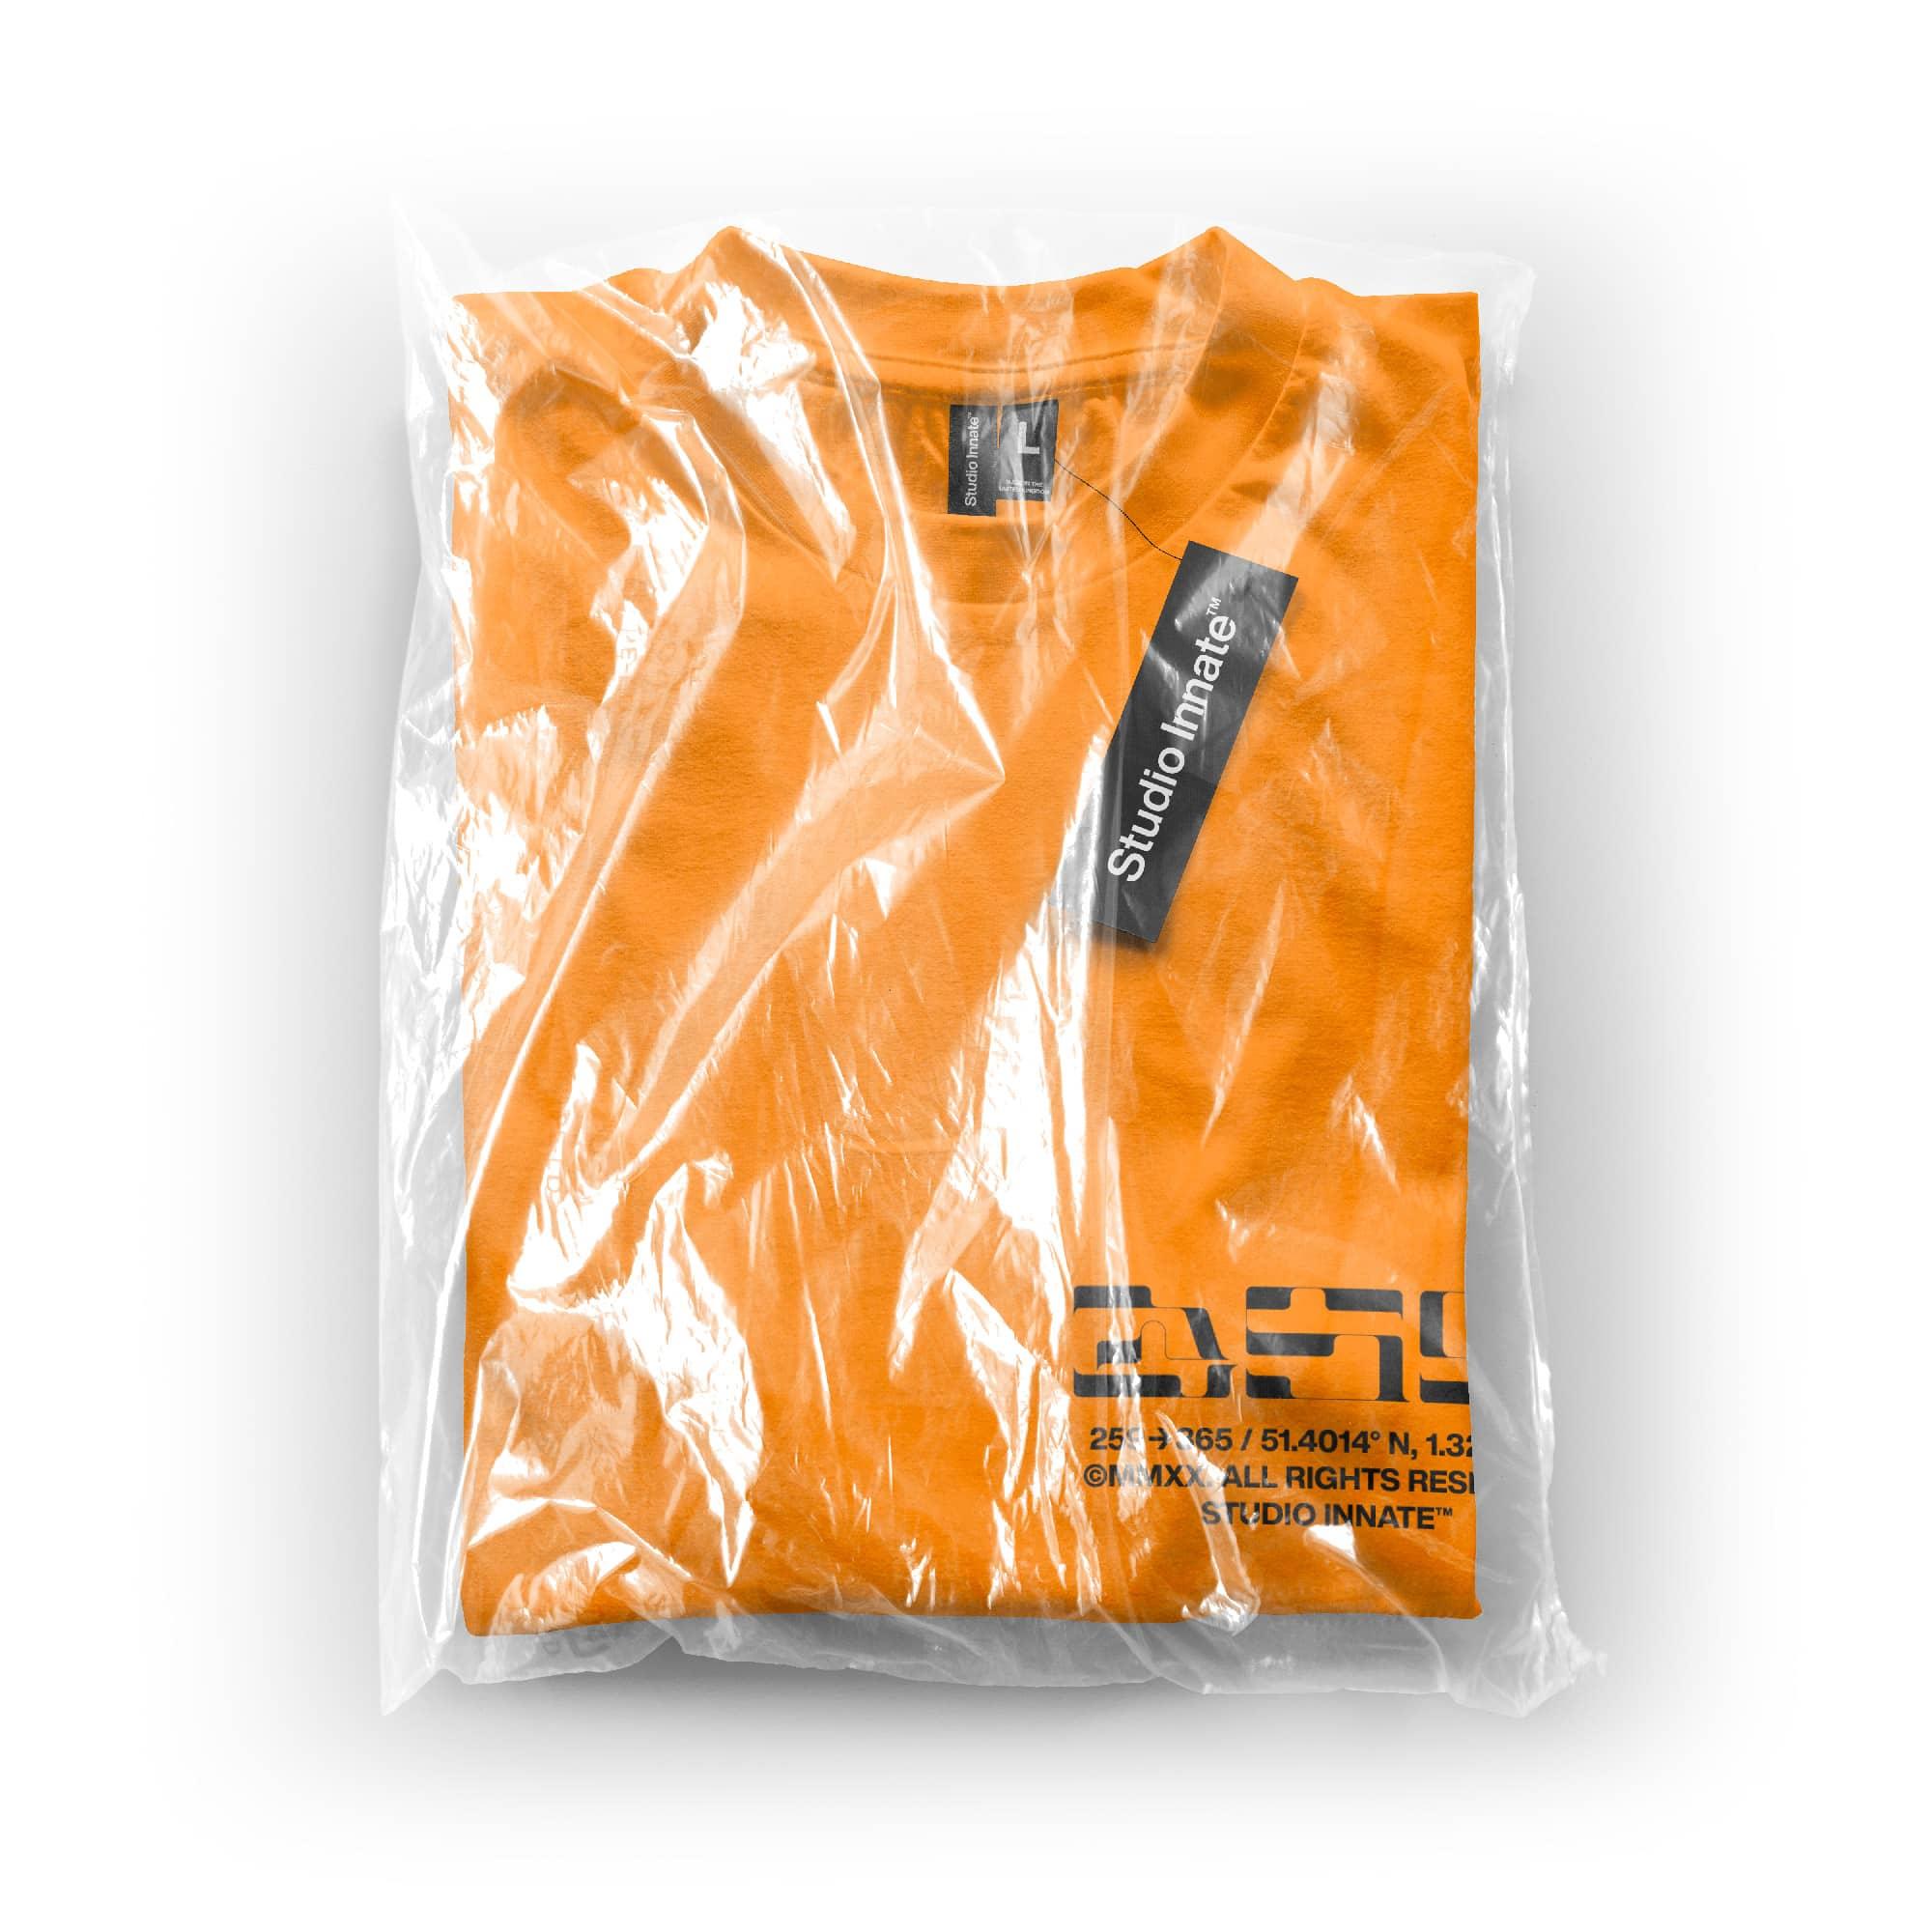 Plastic-Packed-Shirt-by-Studio-Innate